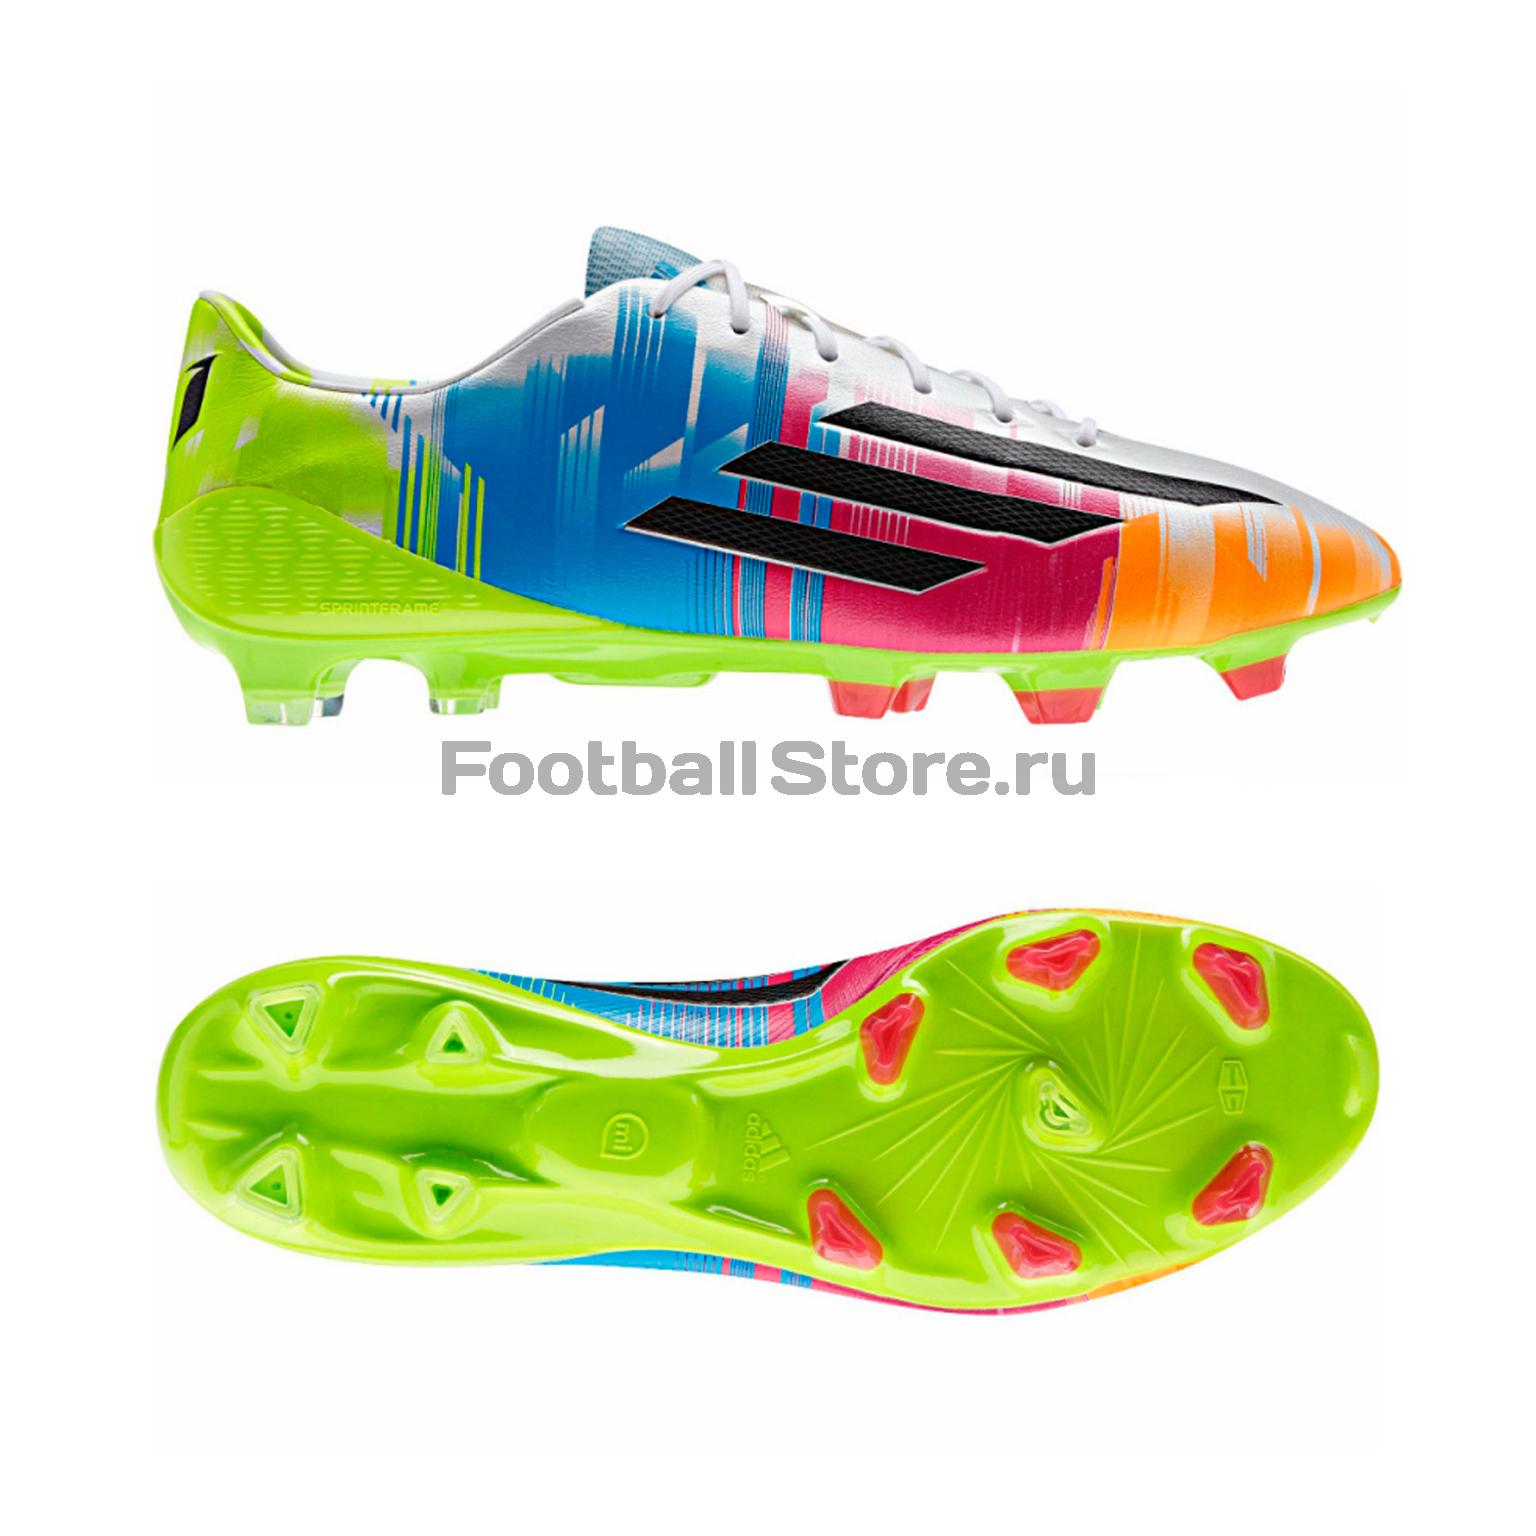 b5e62fe4 Бутсы Adidas F50 Adizero Messi TRX FG F32795 – купить бутсы в ...